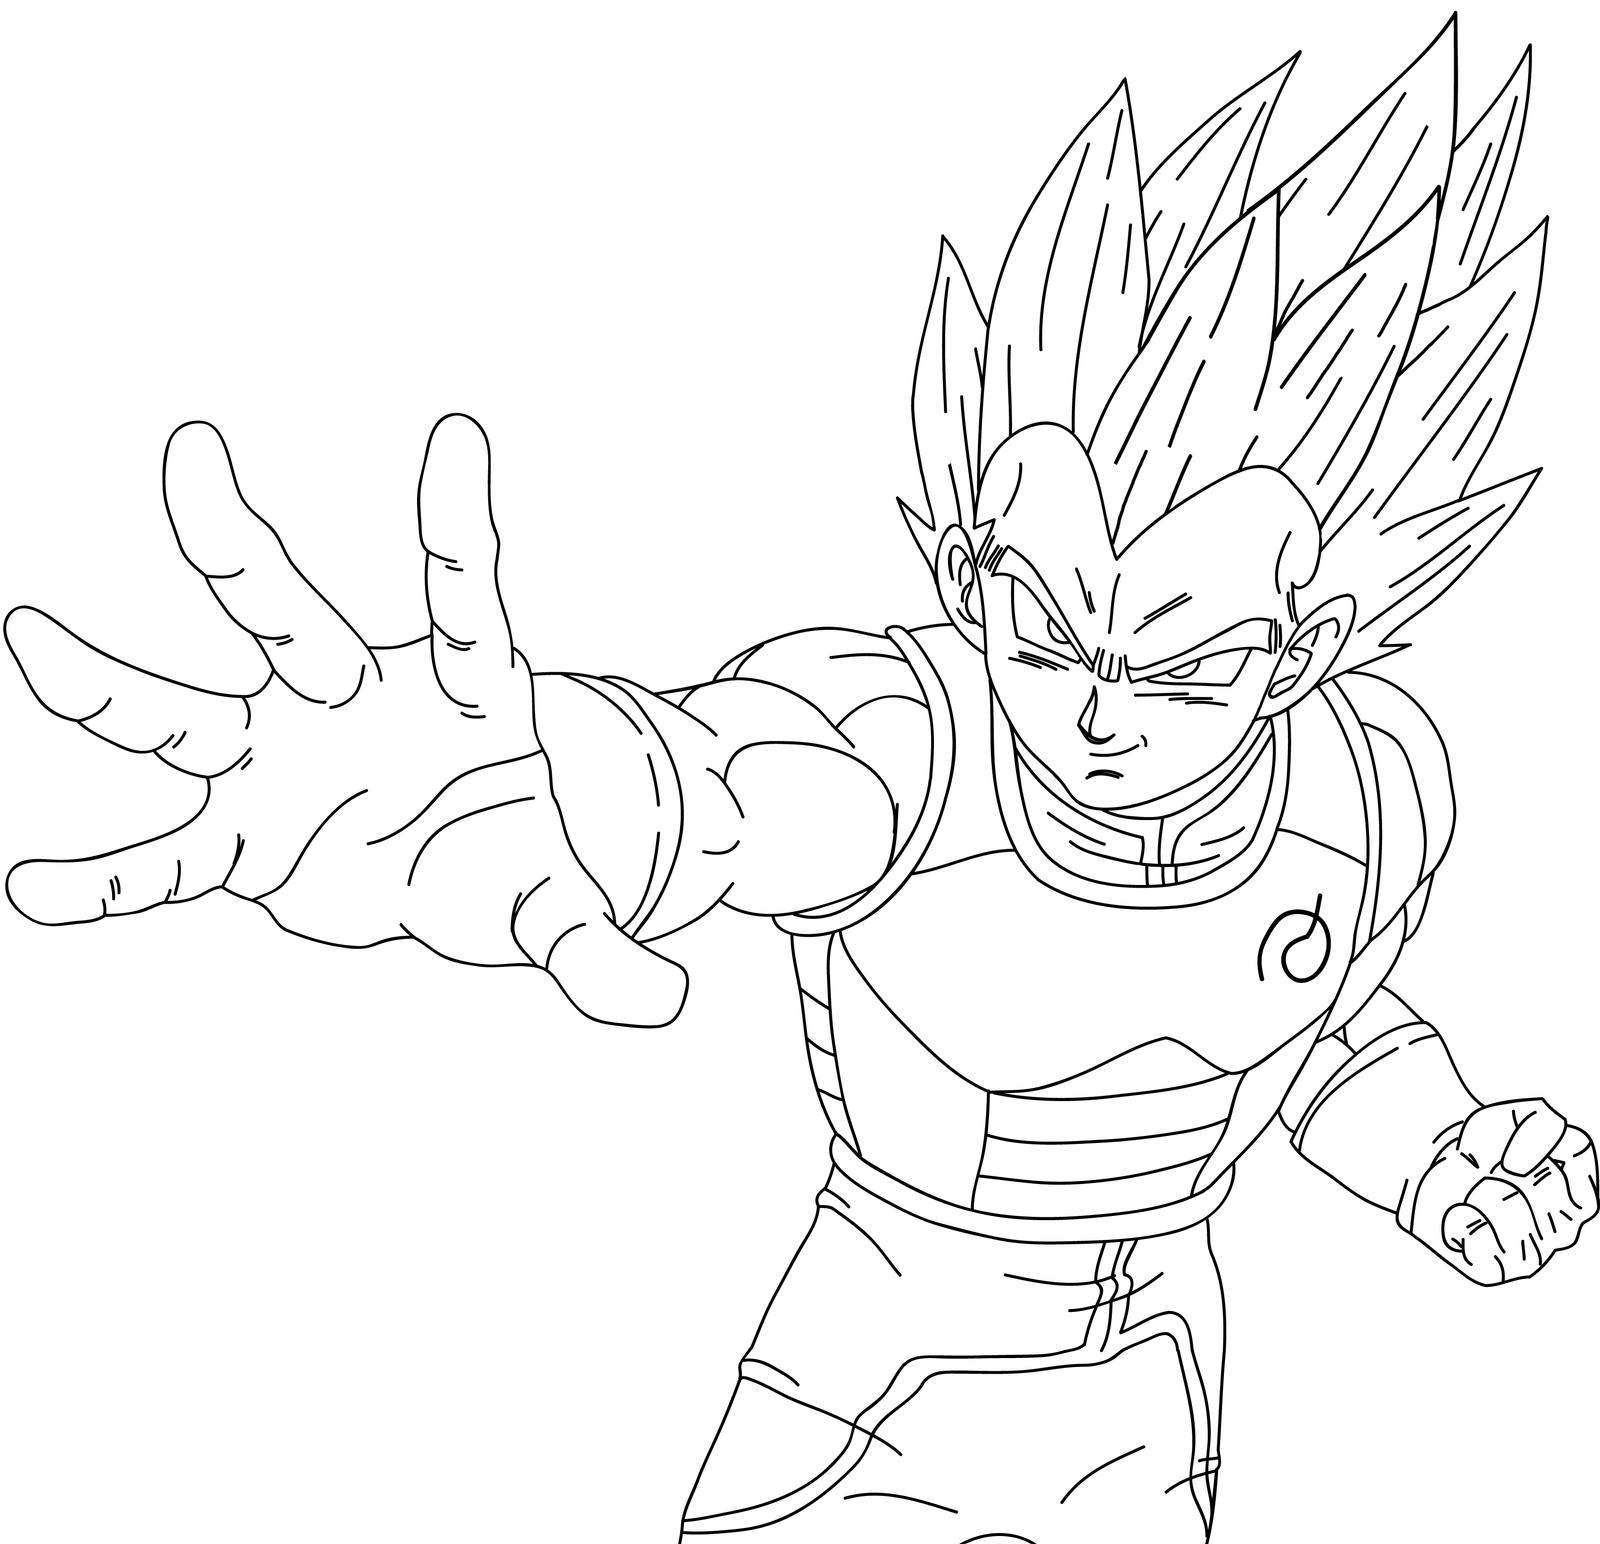 Line Art Vs No Line Art : Vegeta fukkatsu no f ssjgod ss lineart by